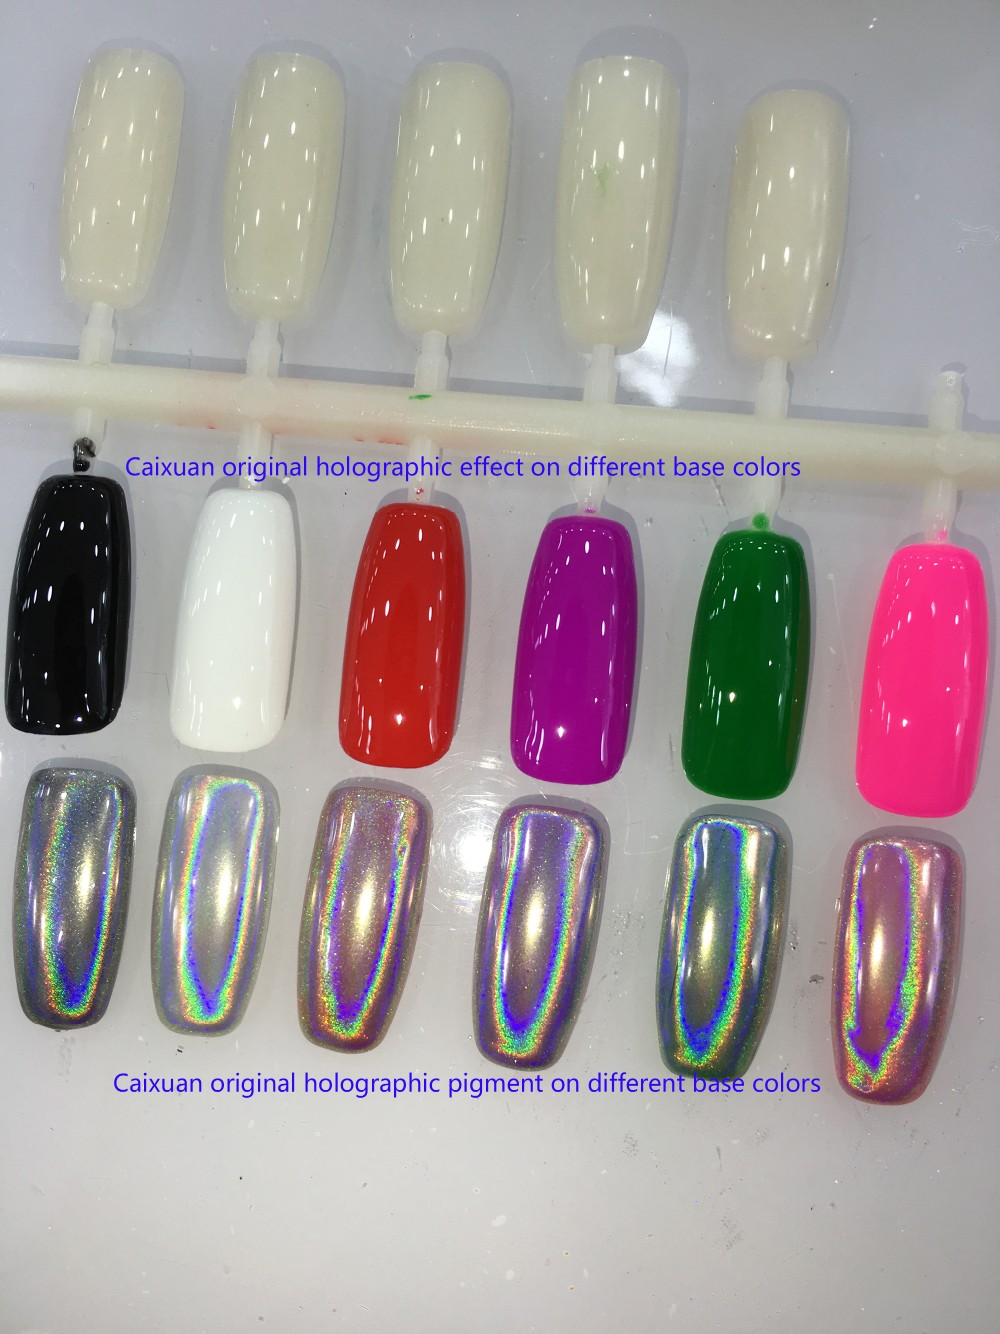 Caixuan Pigmento Holográfico Arco Iris Pigmento/laser Efecto,Polvo ...